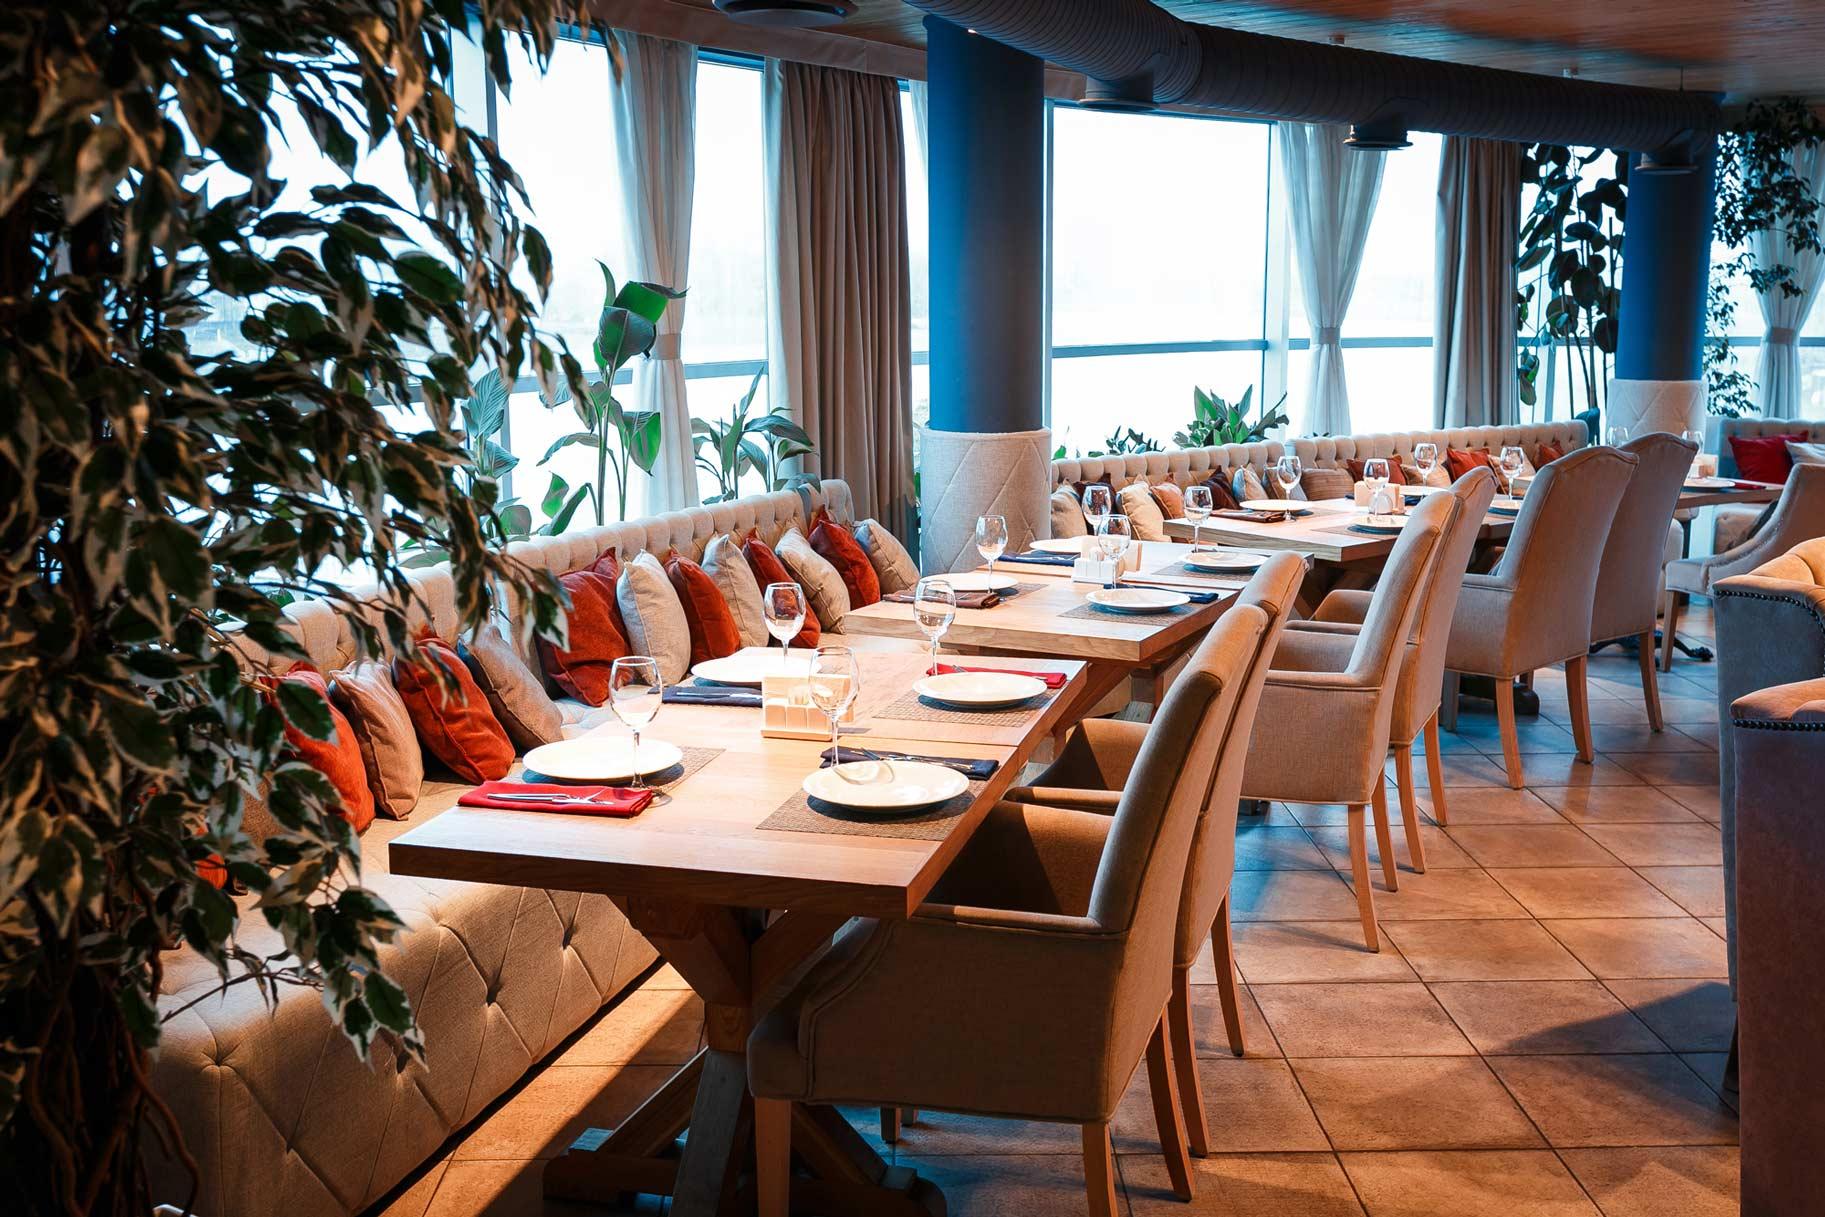 ресторан мост краснодар фото предпочитают вязать